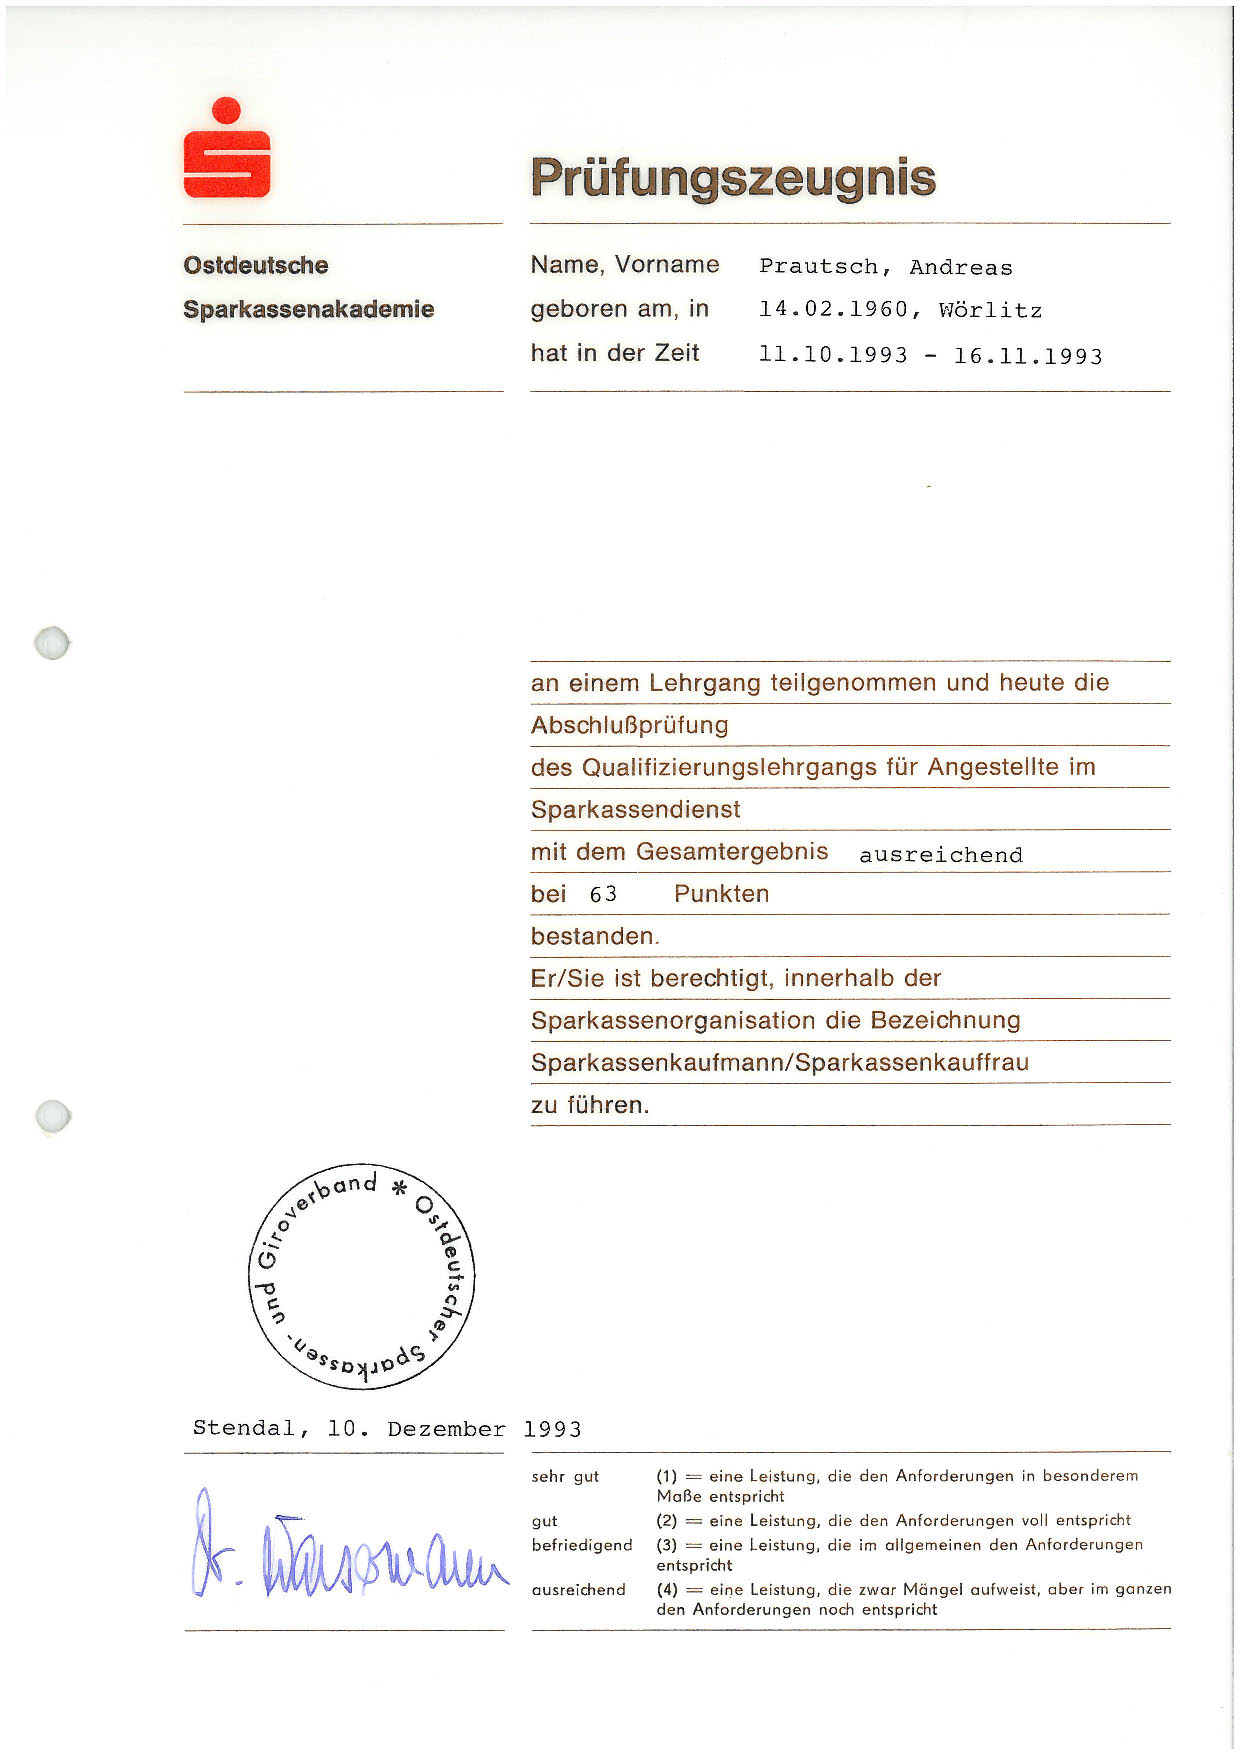 Sparkassenkaufmann - 1993